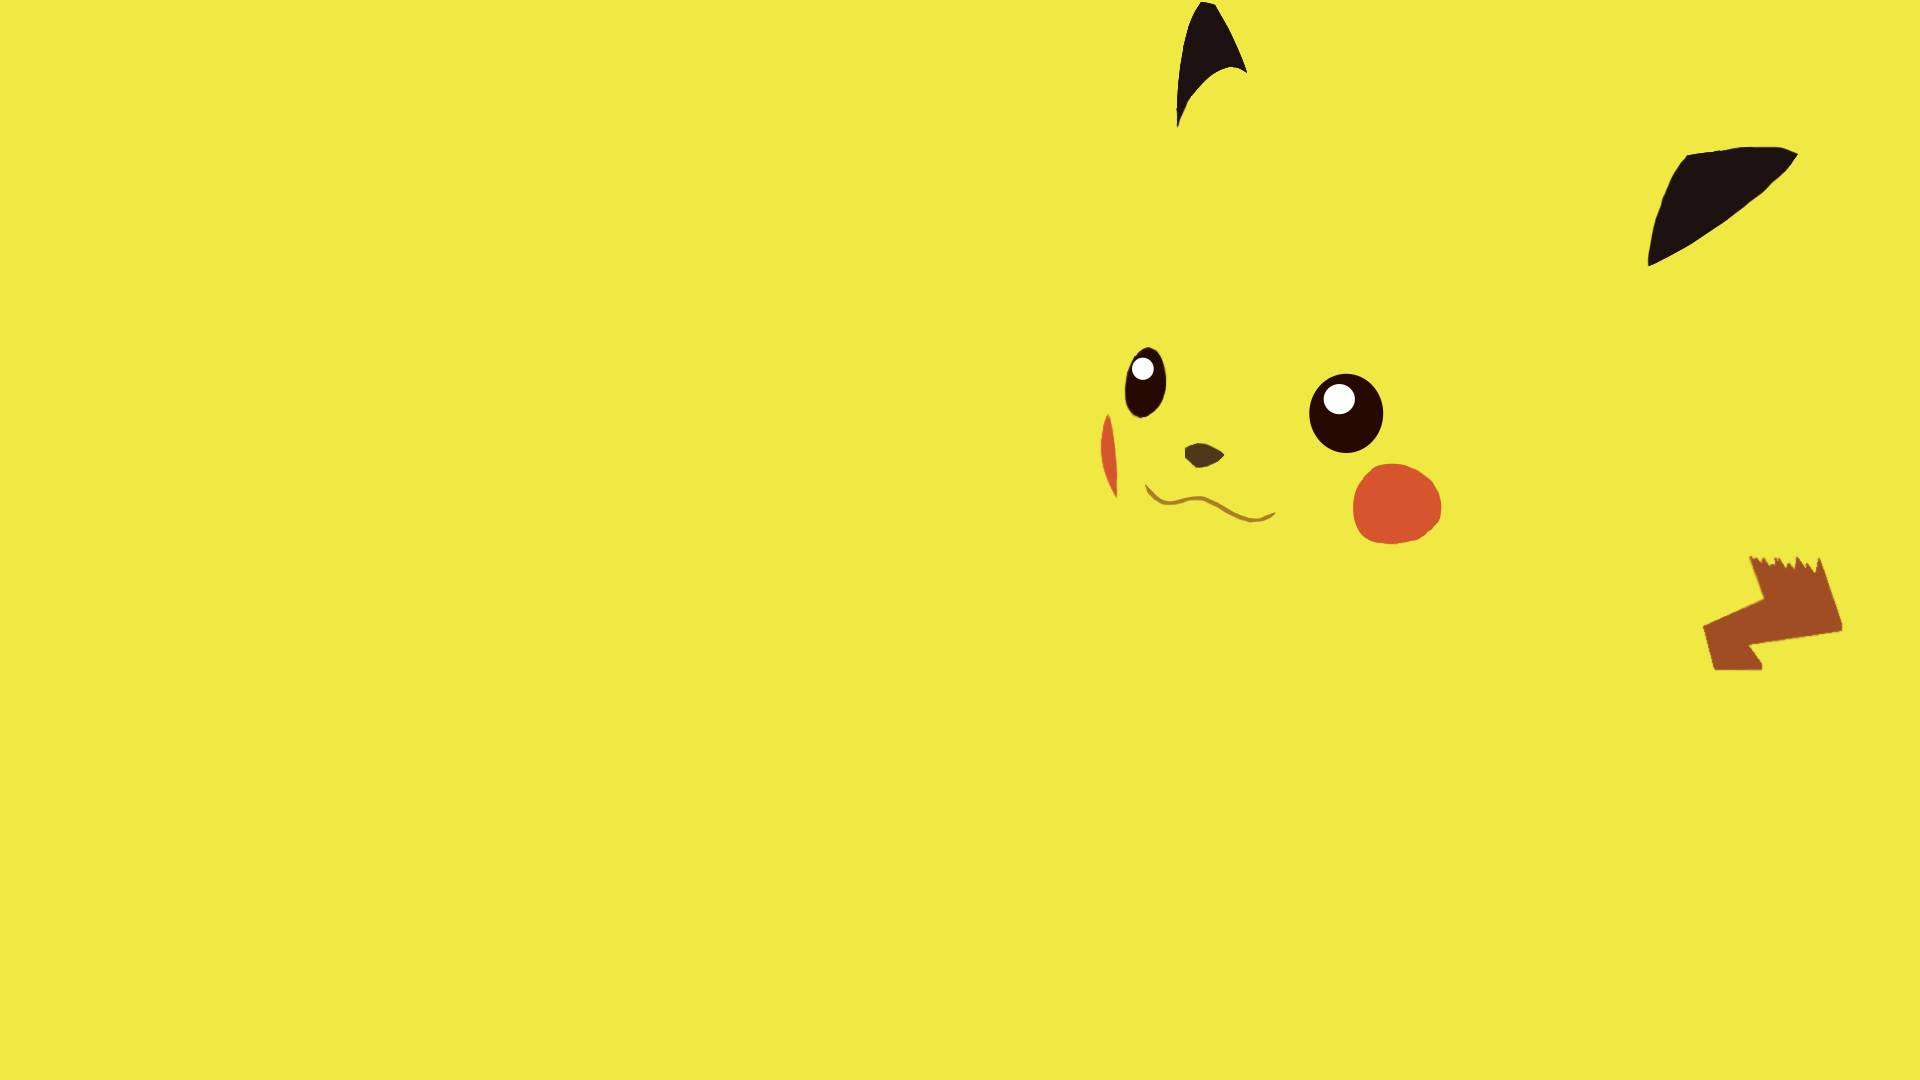 Pikachu fanart   Pokemon Wallpaper 1920x1080